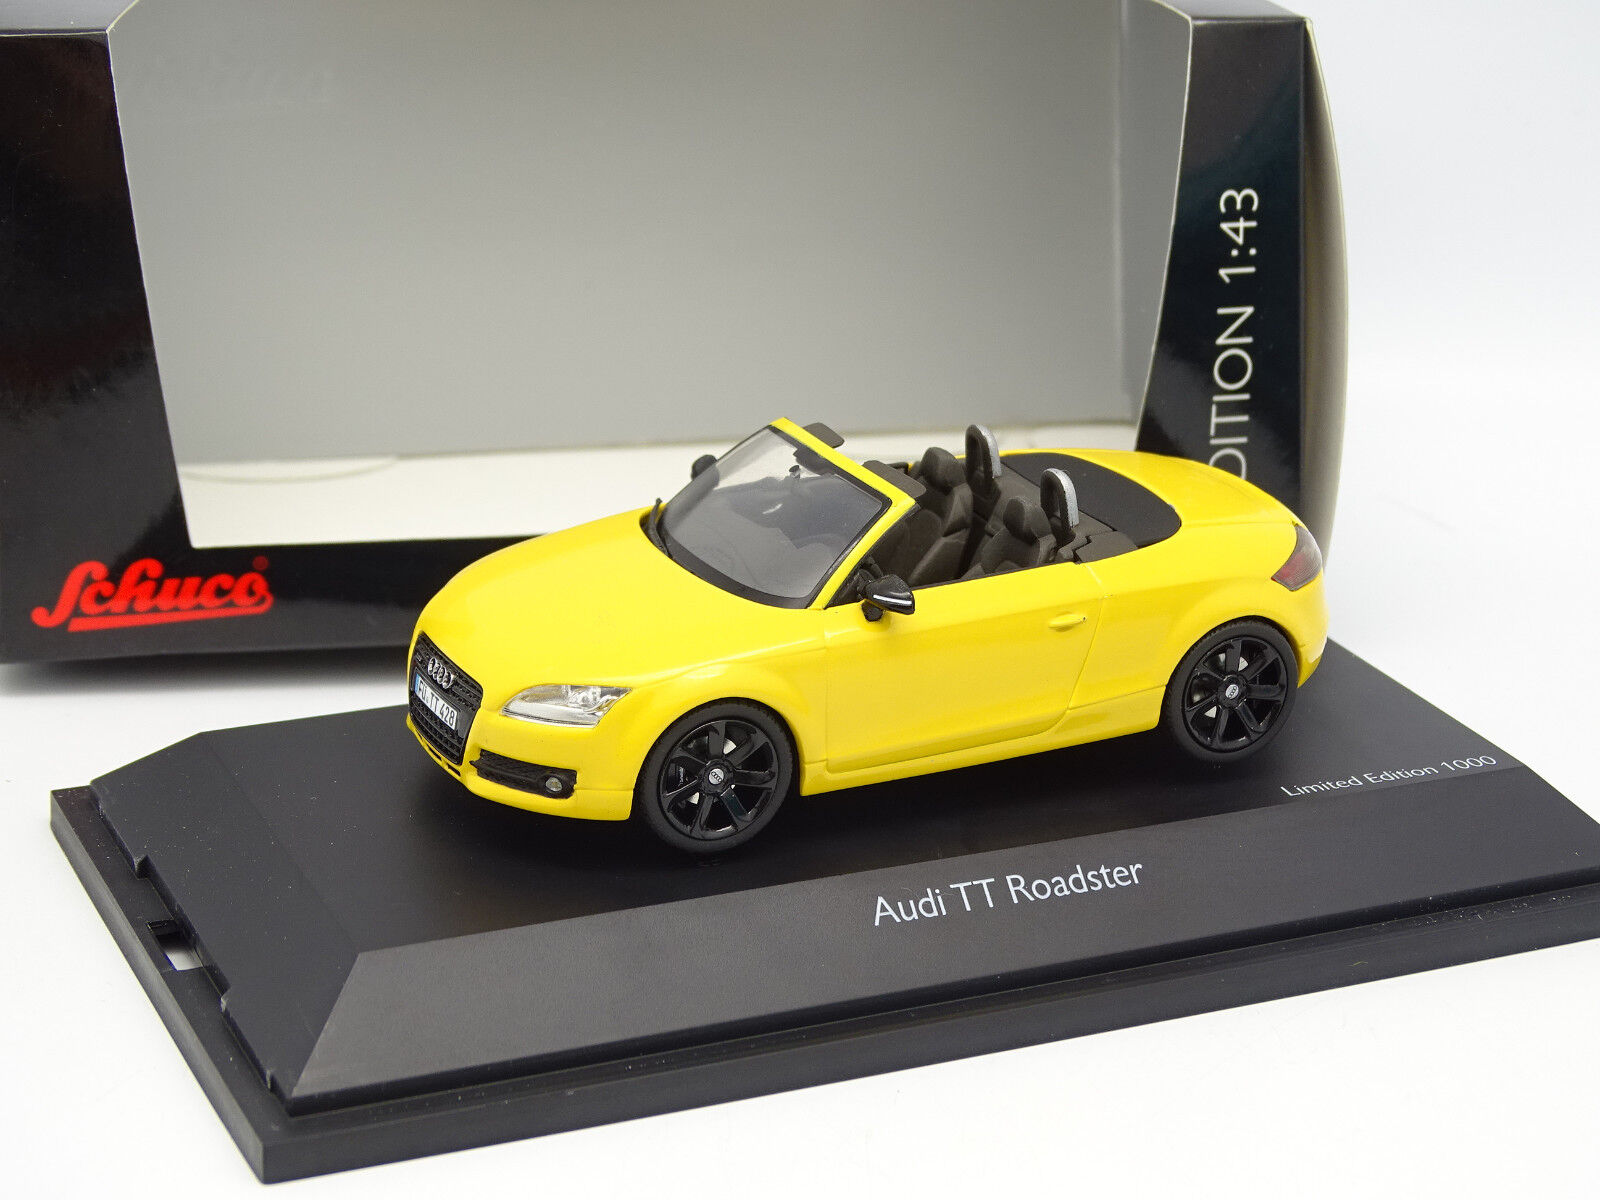 Schuco 1/43 - Audi Tt Roadster Gialla